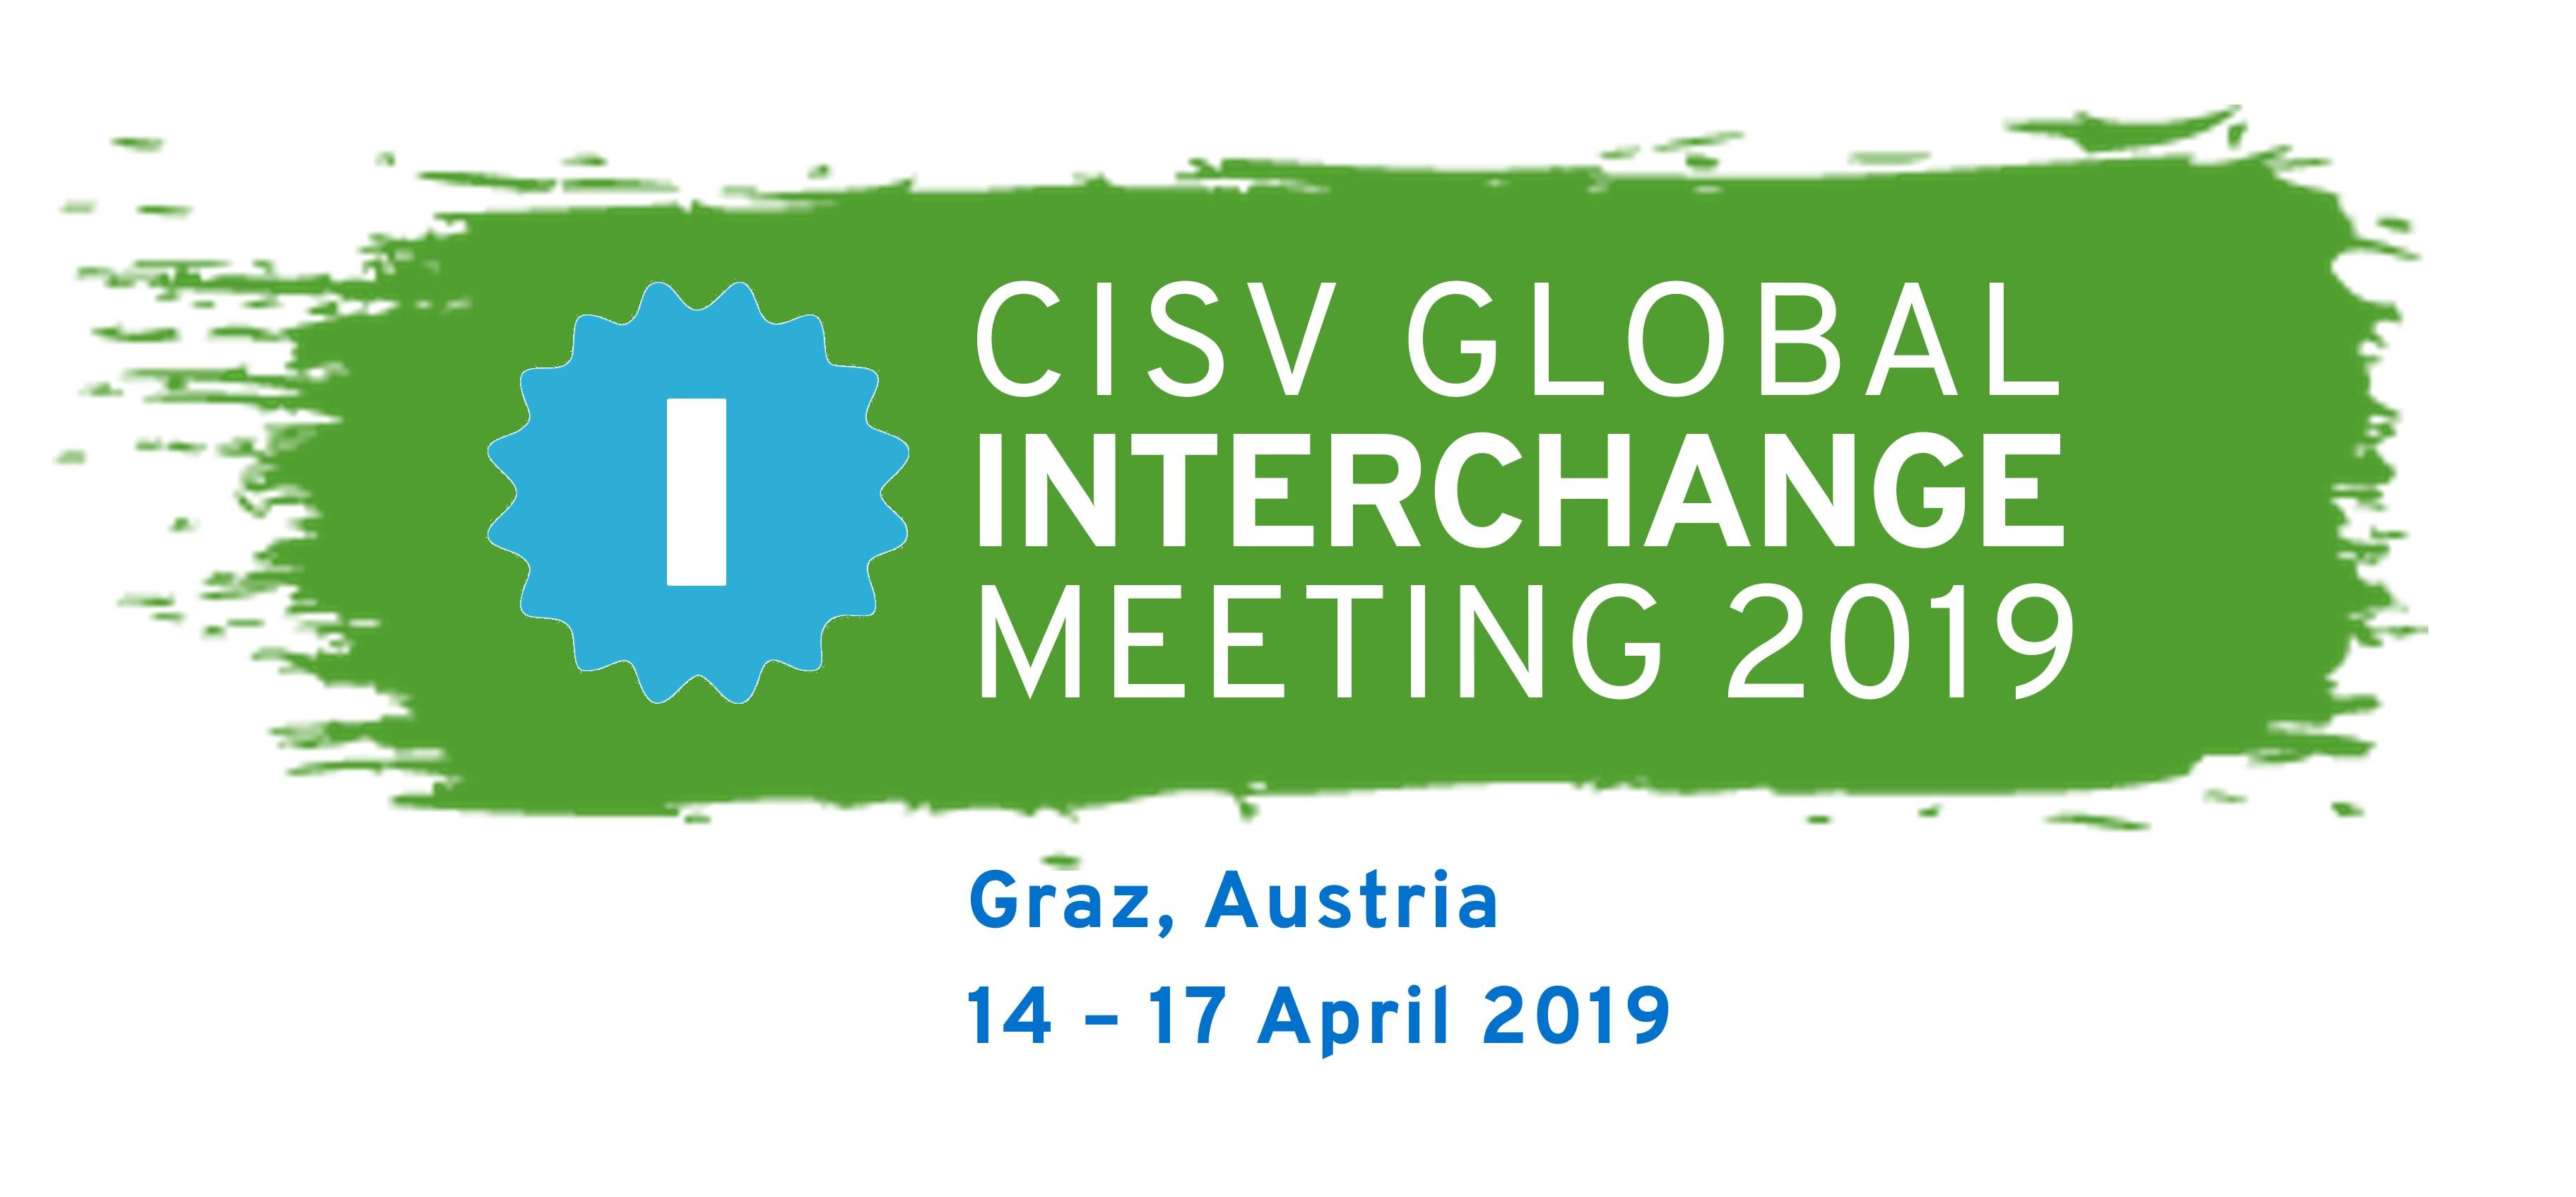 Global Interchange Meeting 2019 (international)